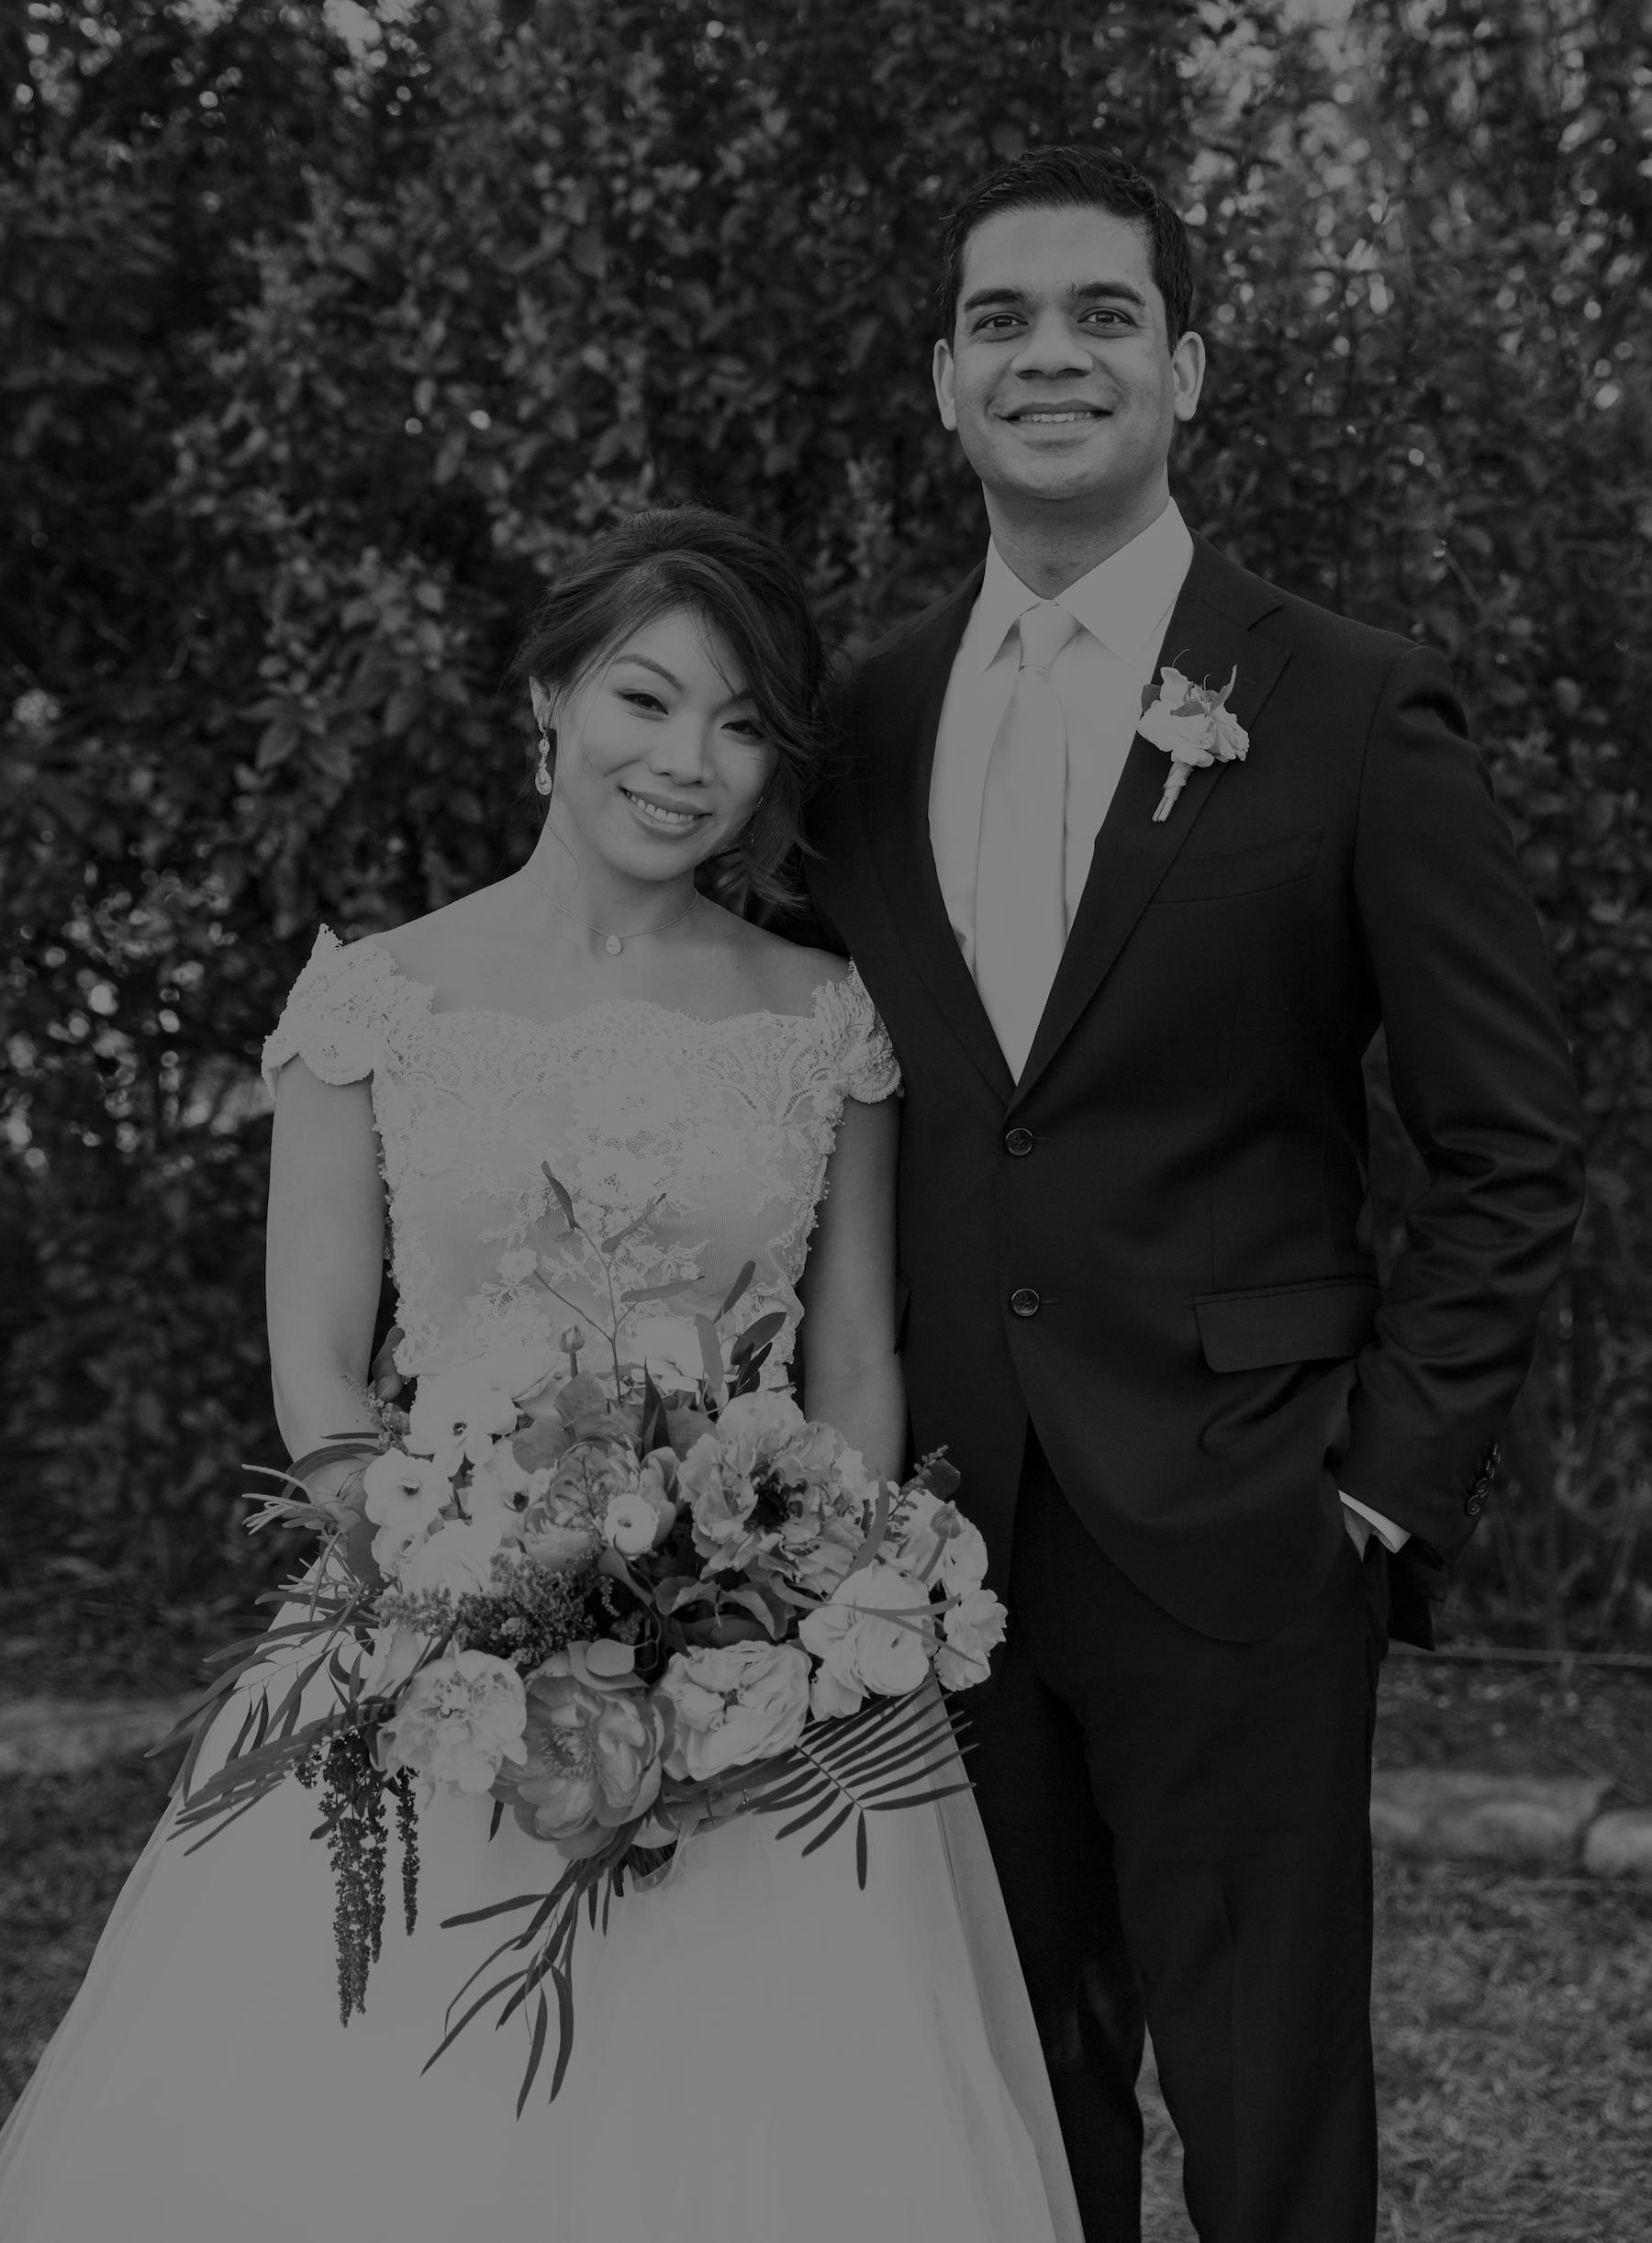 barr-mansion-wedding-austin-texas8876.JPG